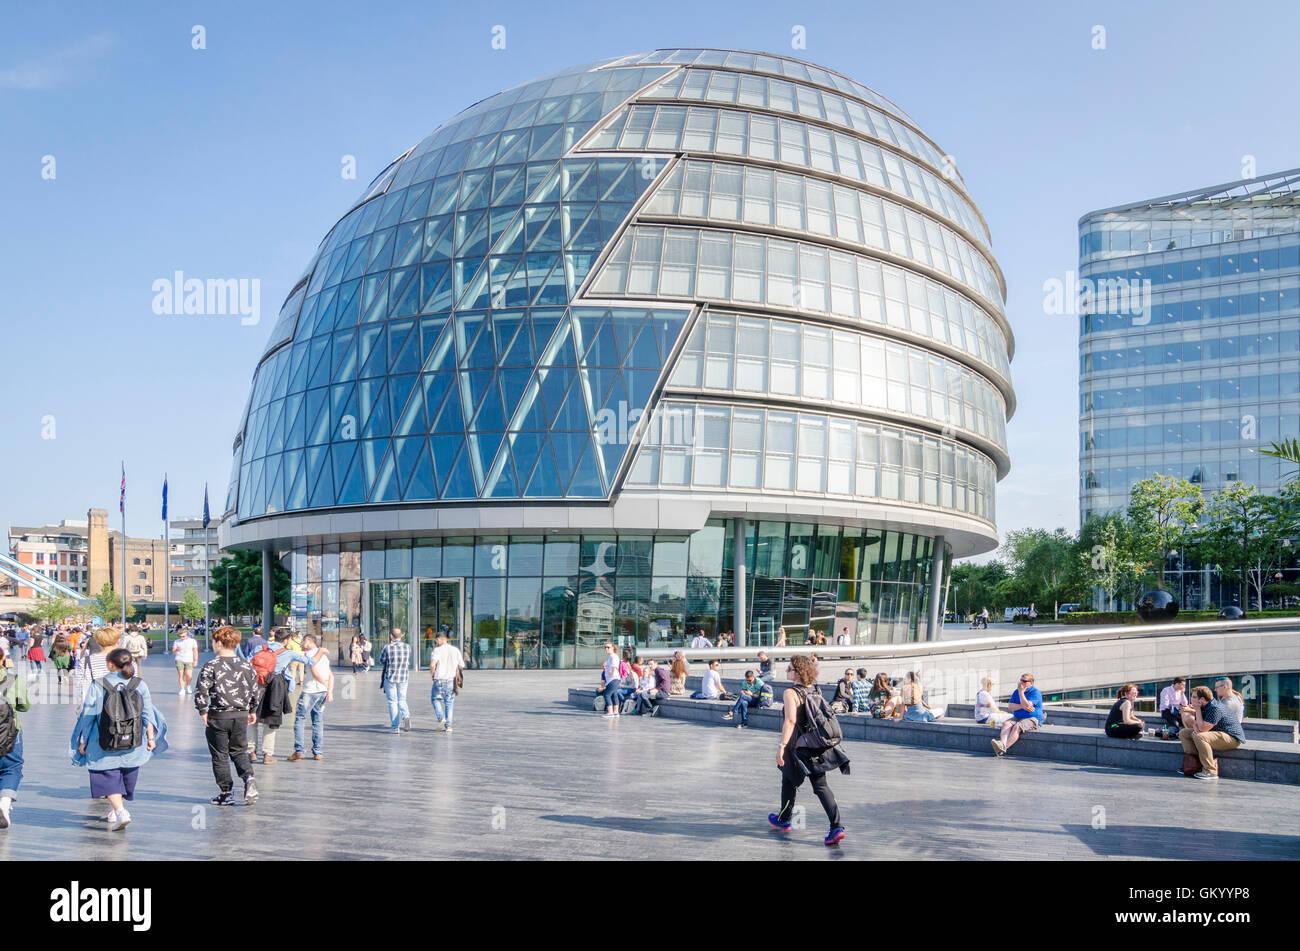 Menschen vor dem Rathaus, London, UK Stockbild